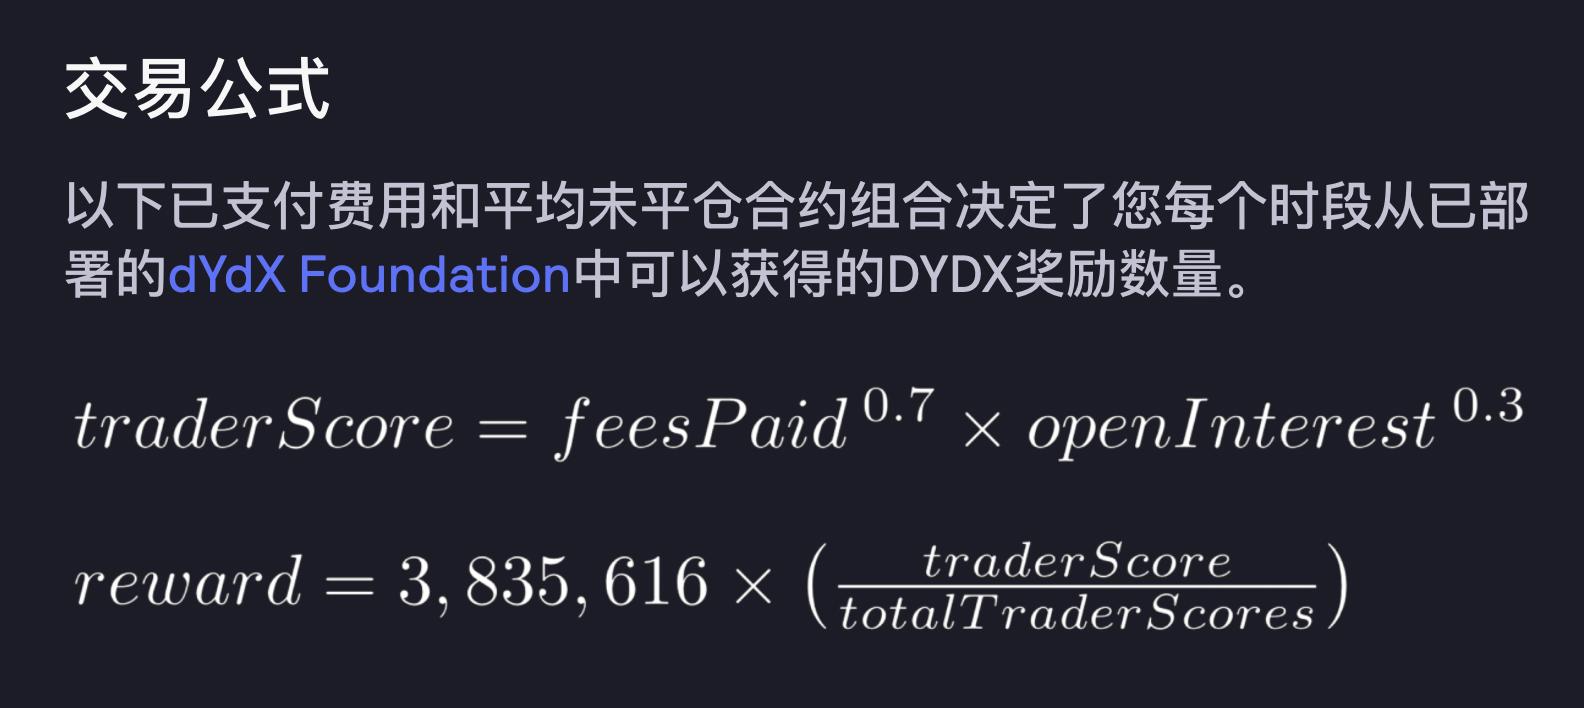 dYdX为何近两日交易量猛增?解读dYdX挖矿规则和最优策略